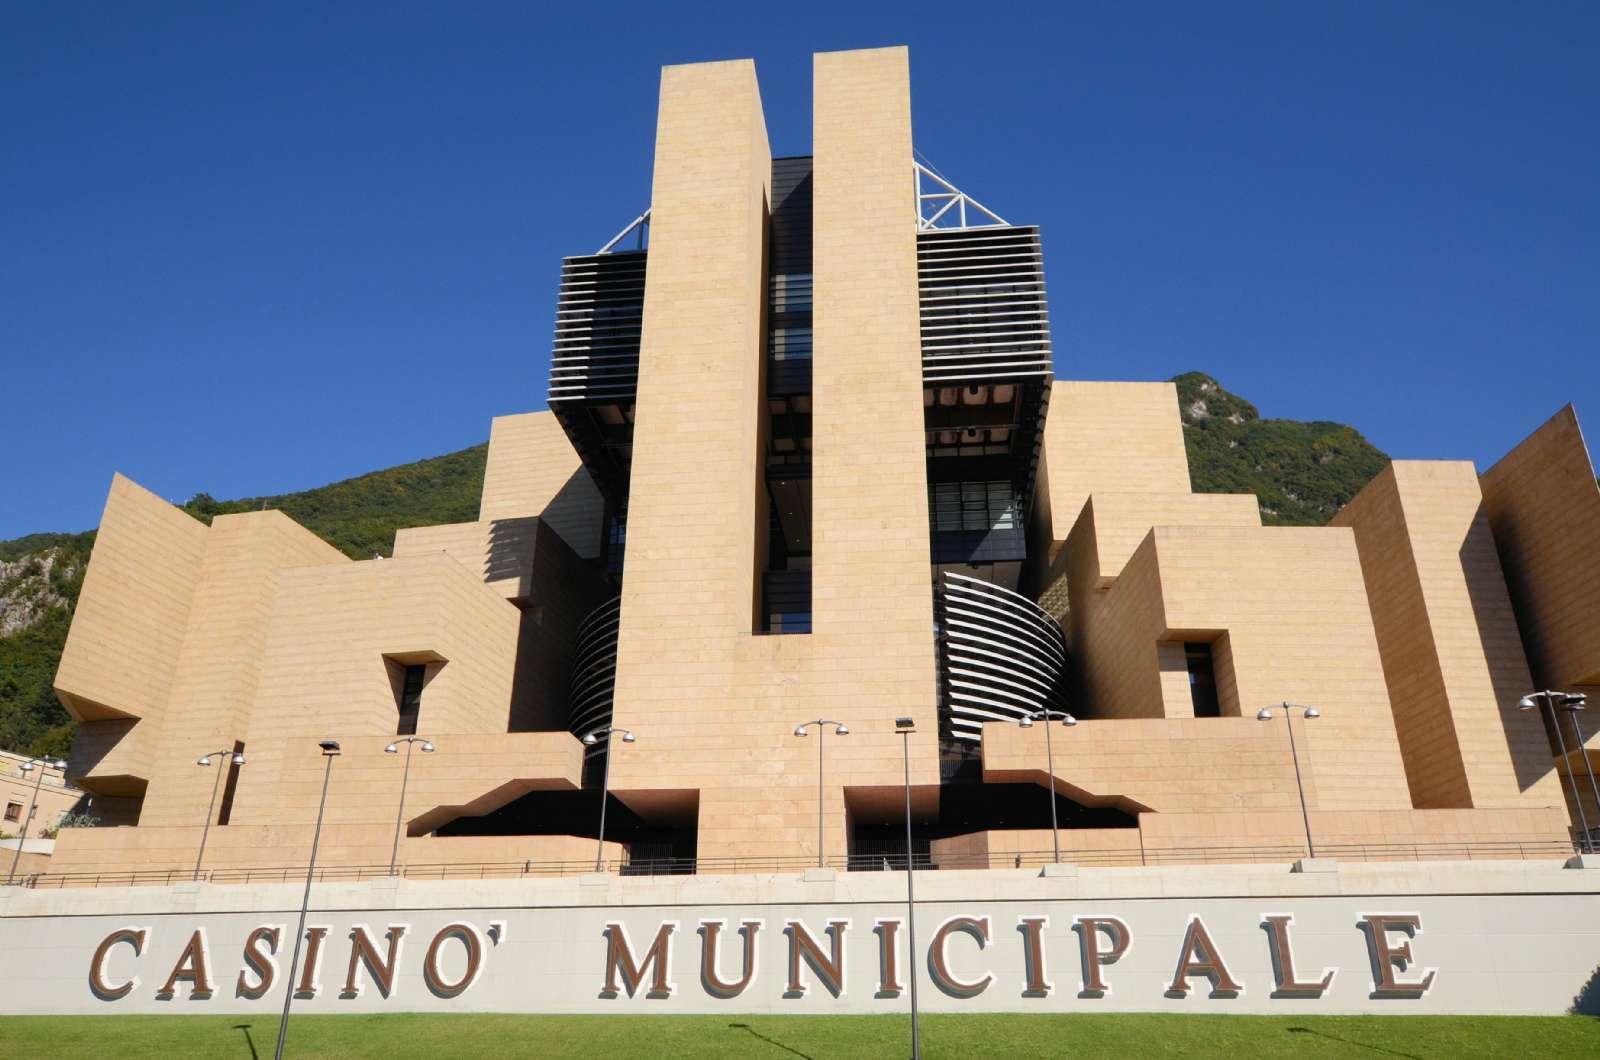 The city's monumental casino